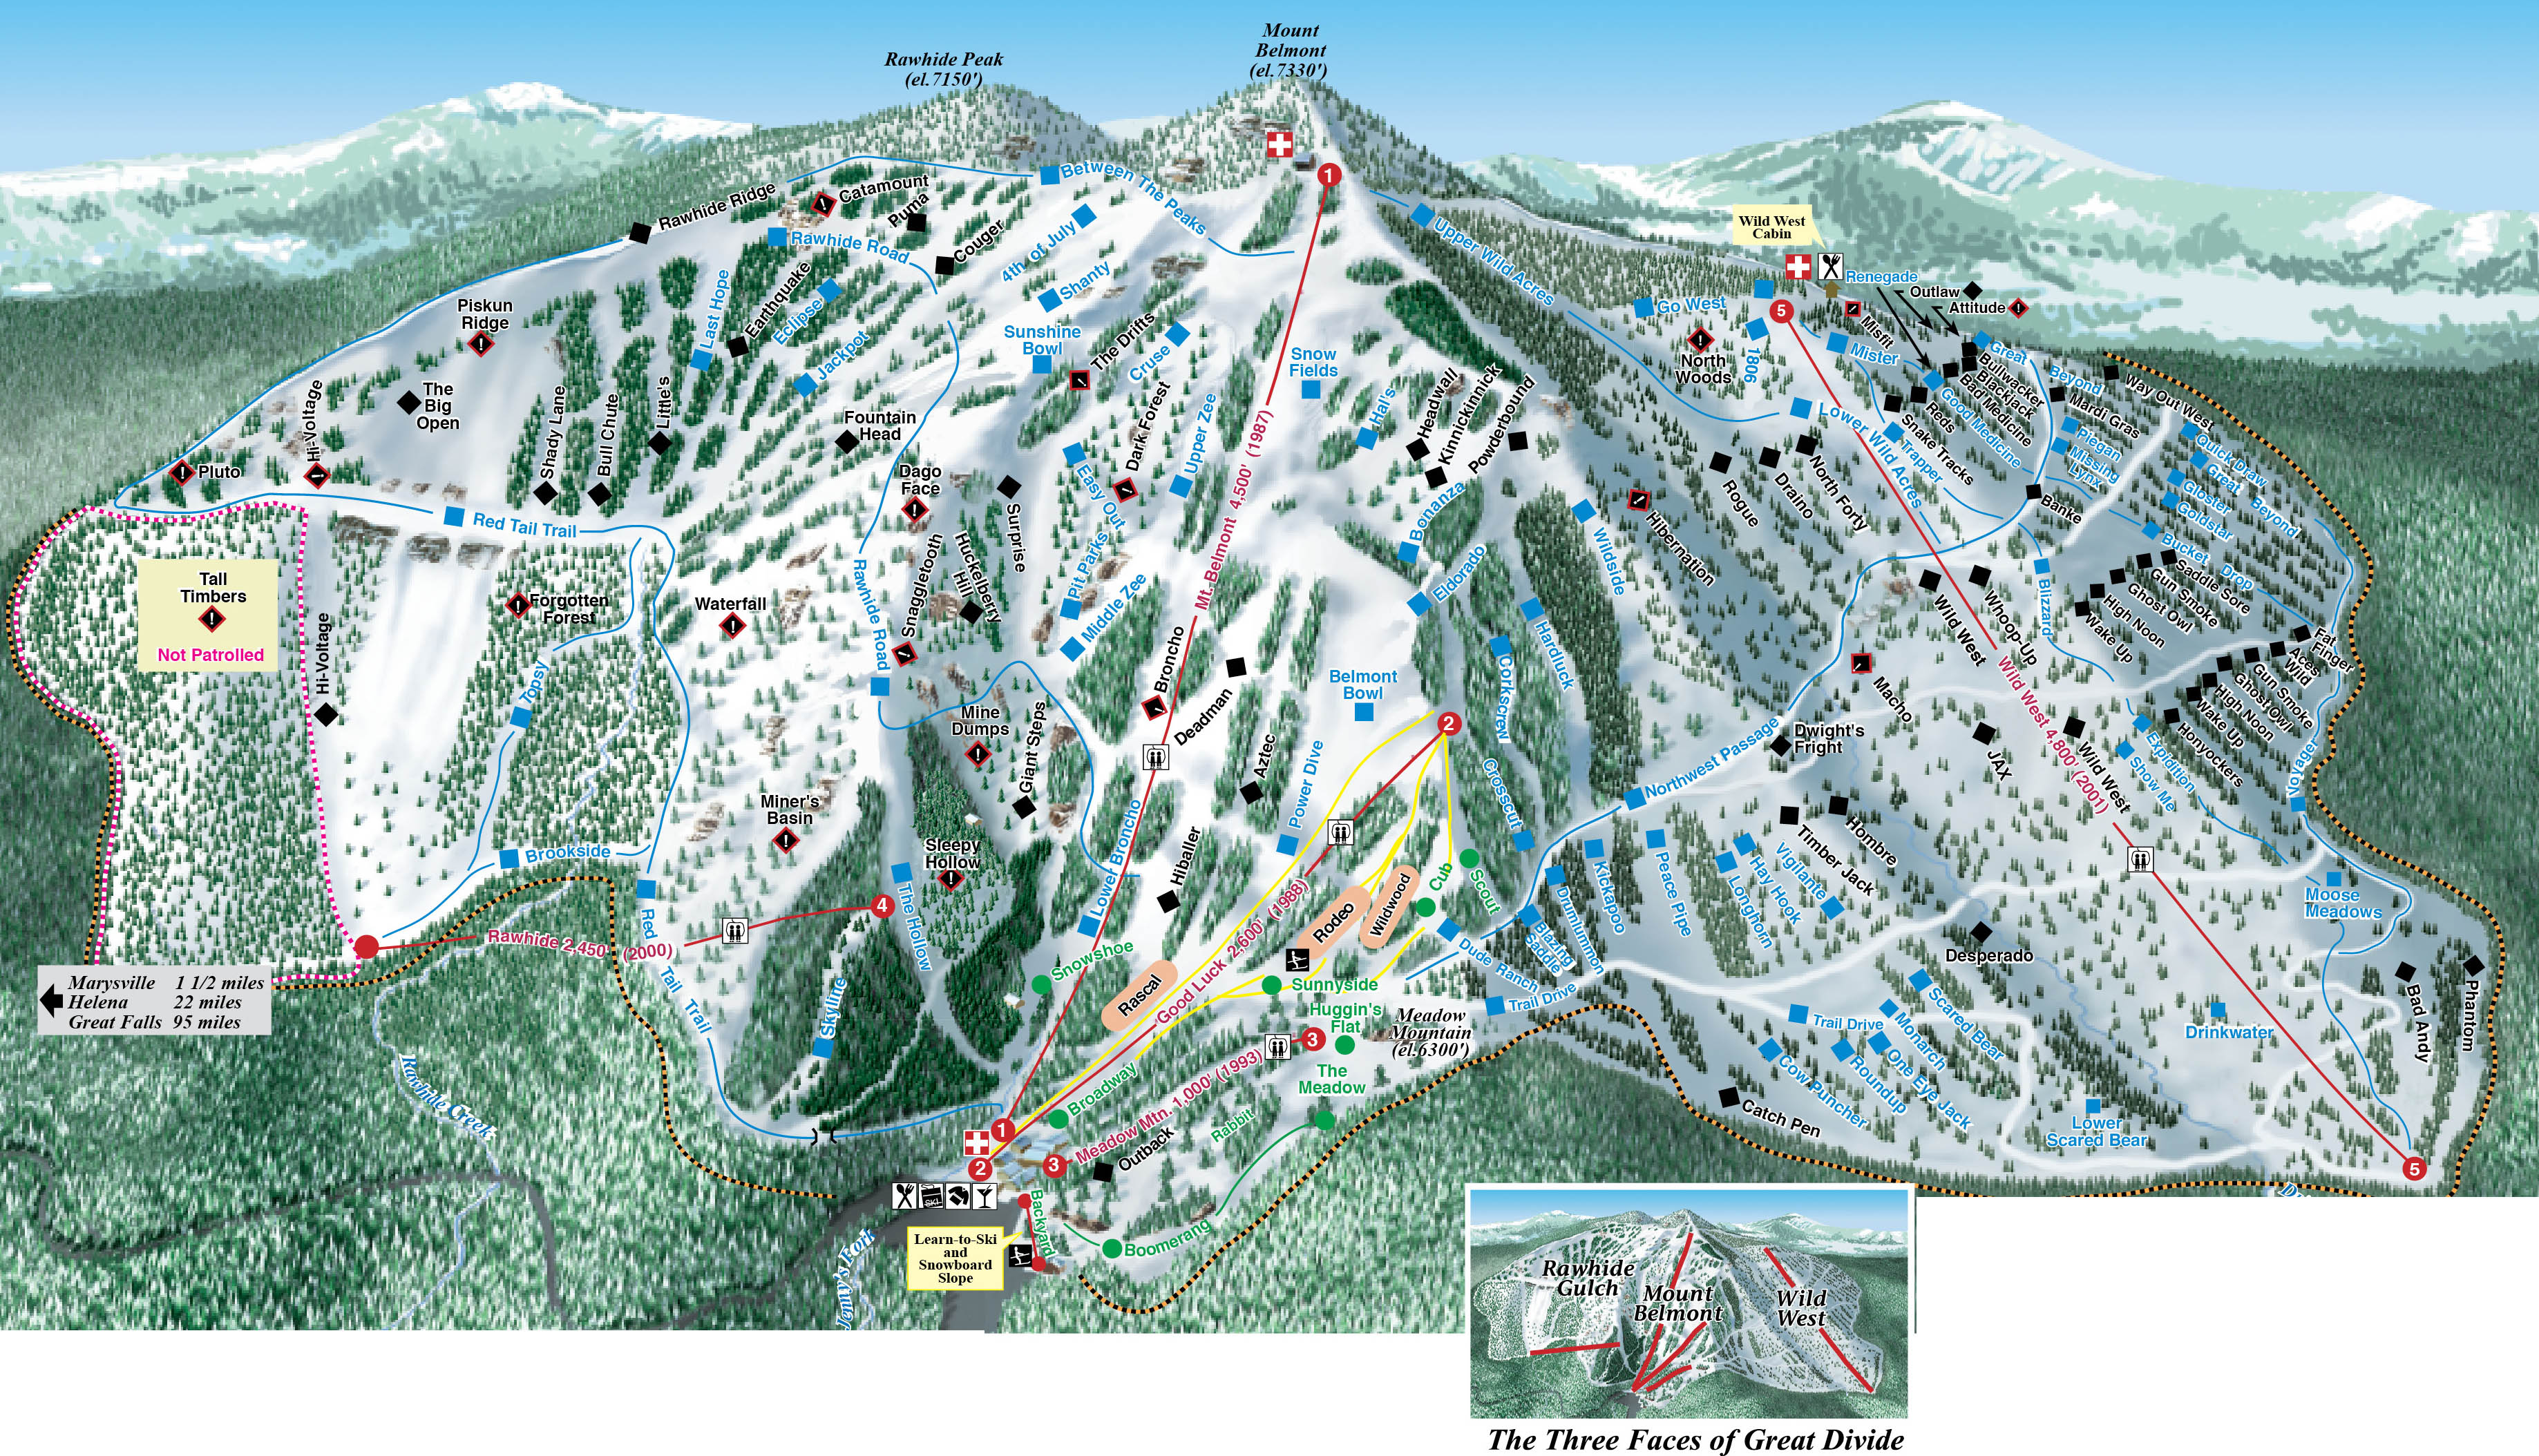 great divide ski trail map - 7385 belmont drive marysville mt 59640